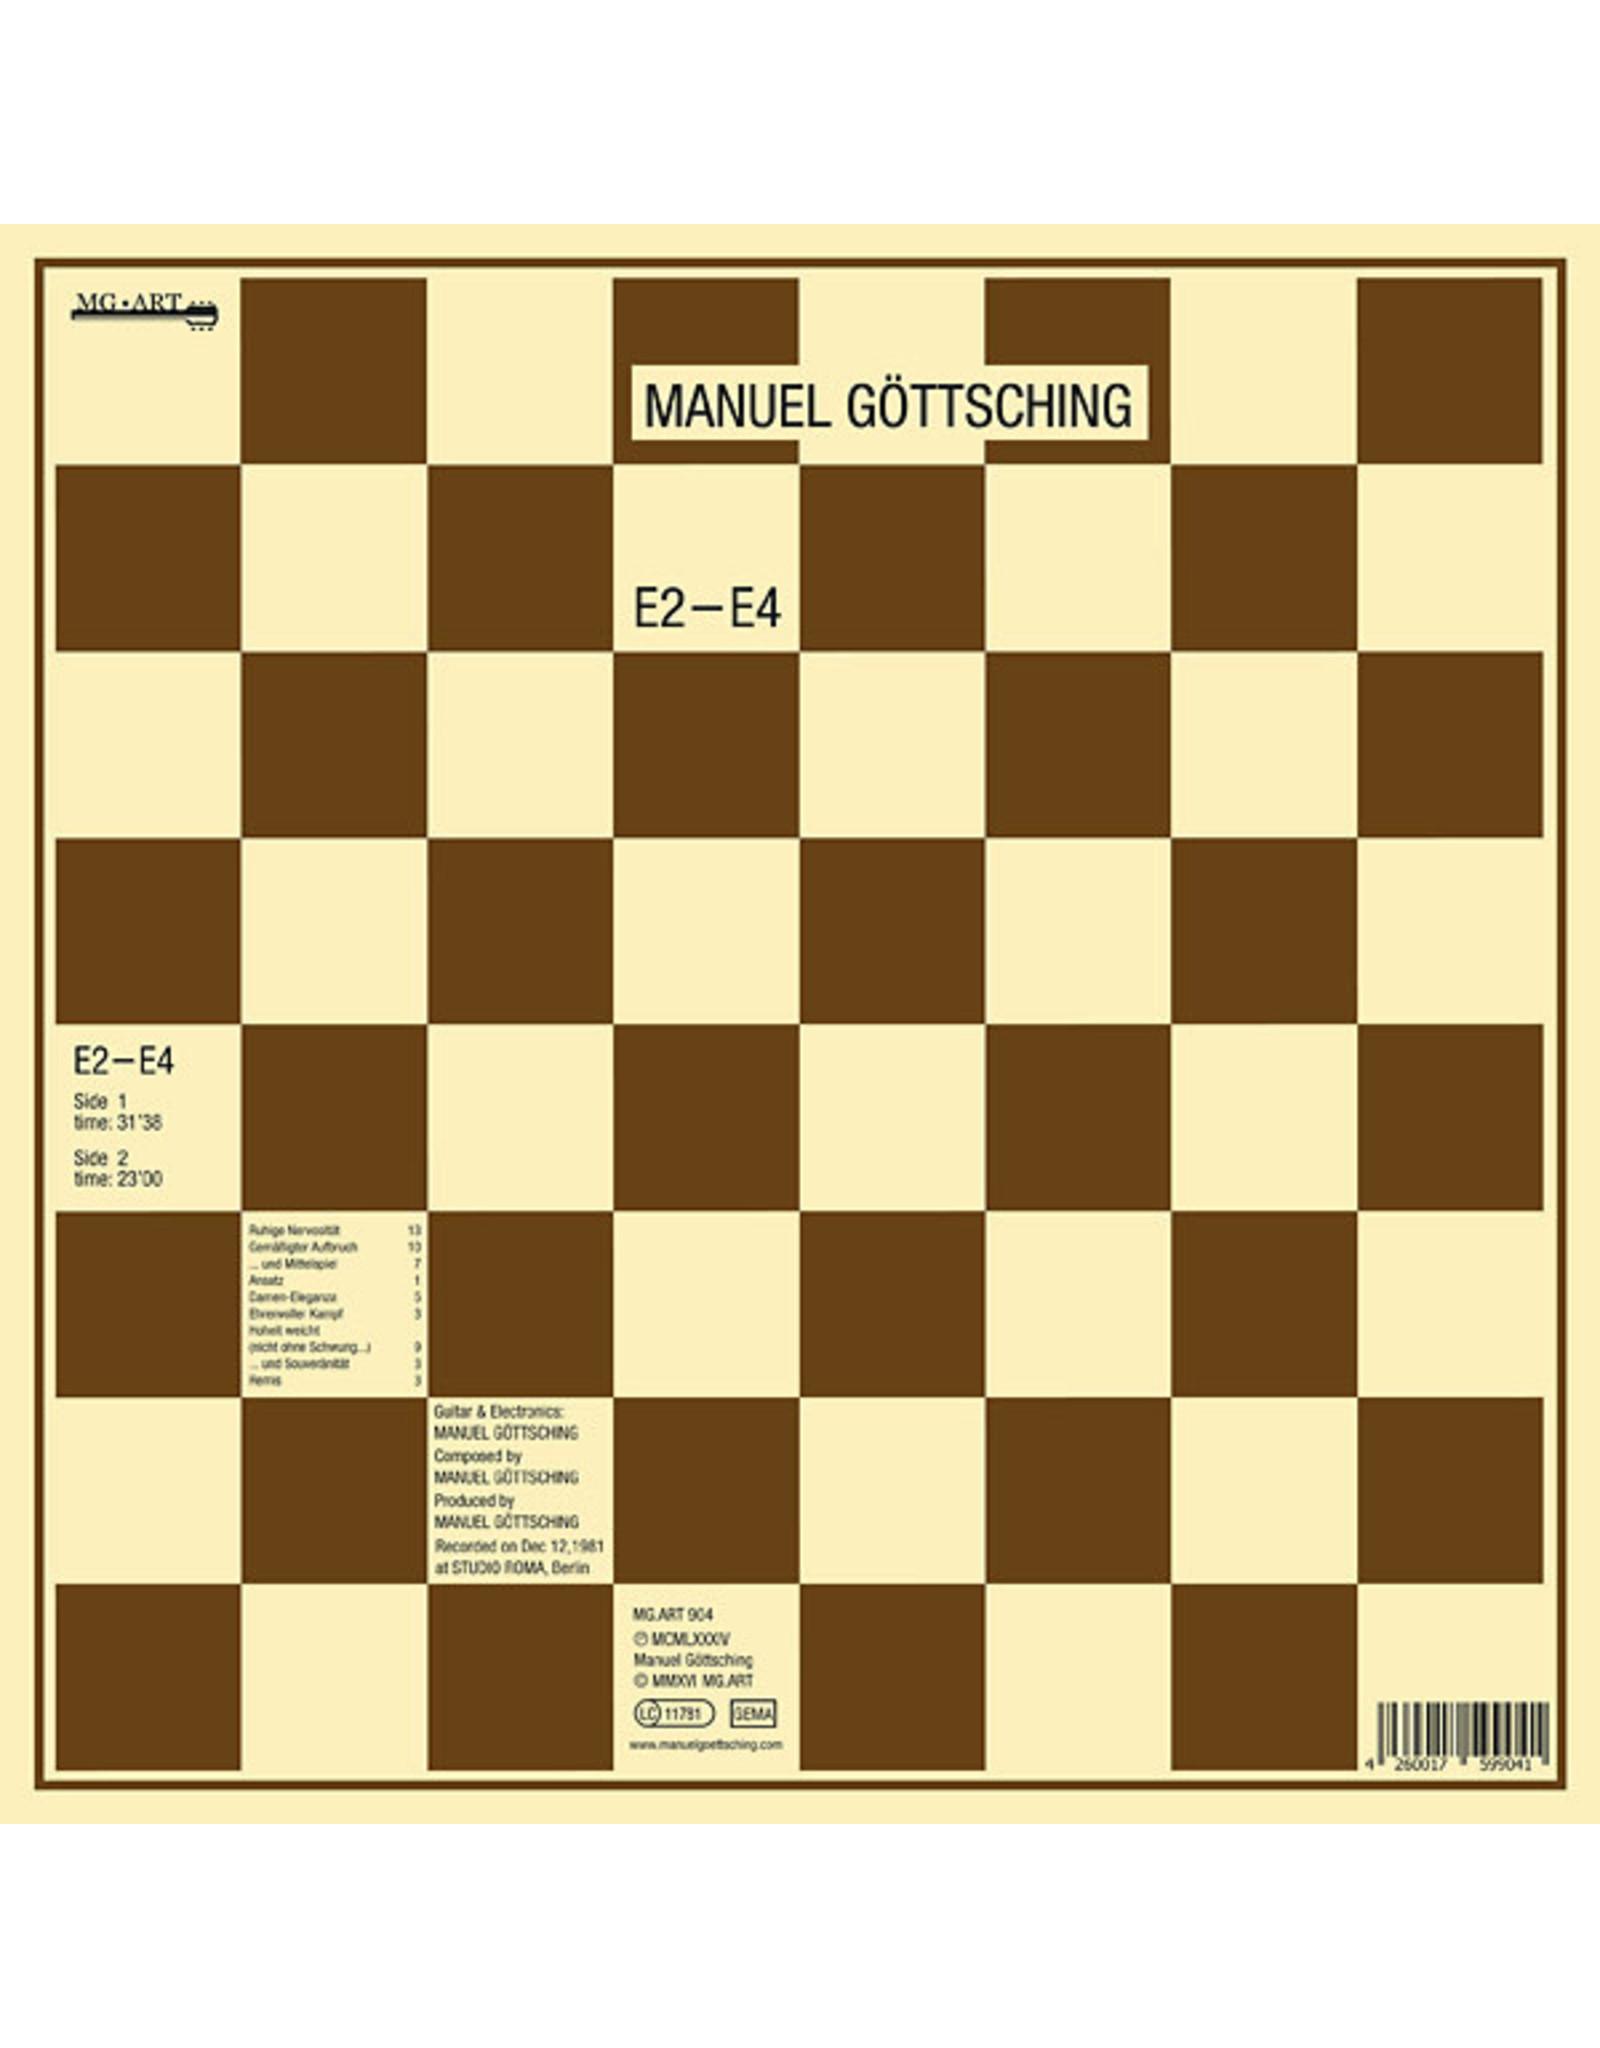 New Vinyl Manuel Göttsching - E2-E4 (35th Anniversary Edition) LP